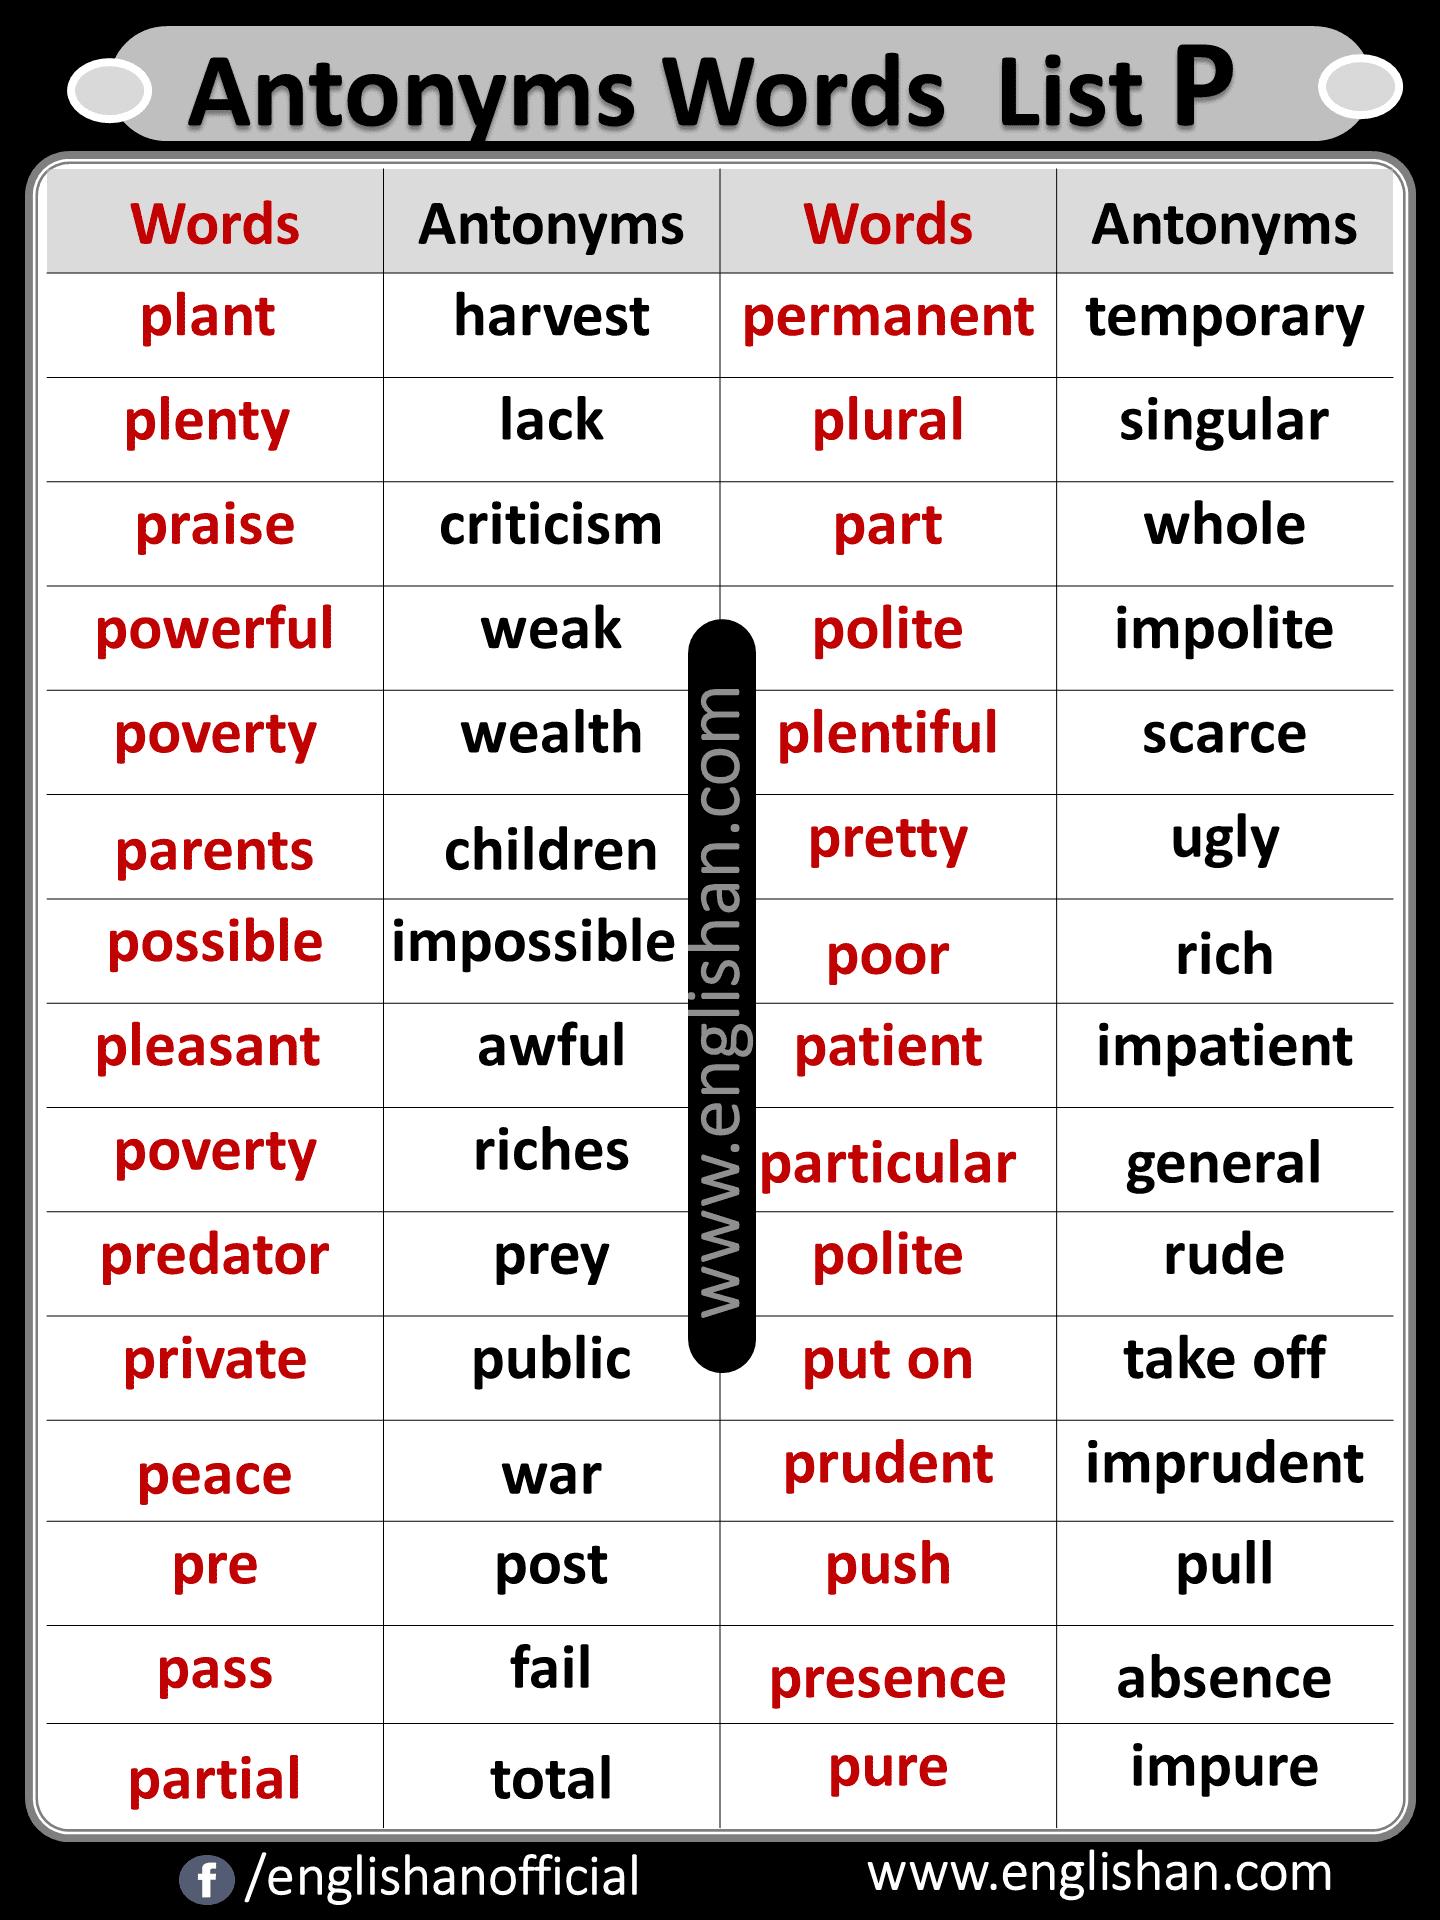 Antonyms Words List P